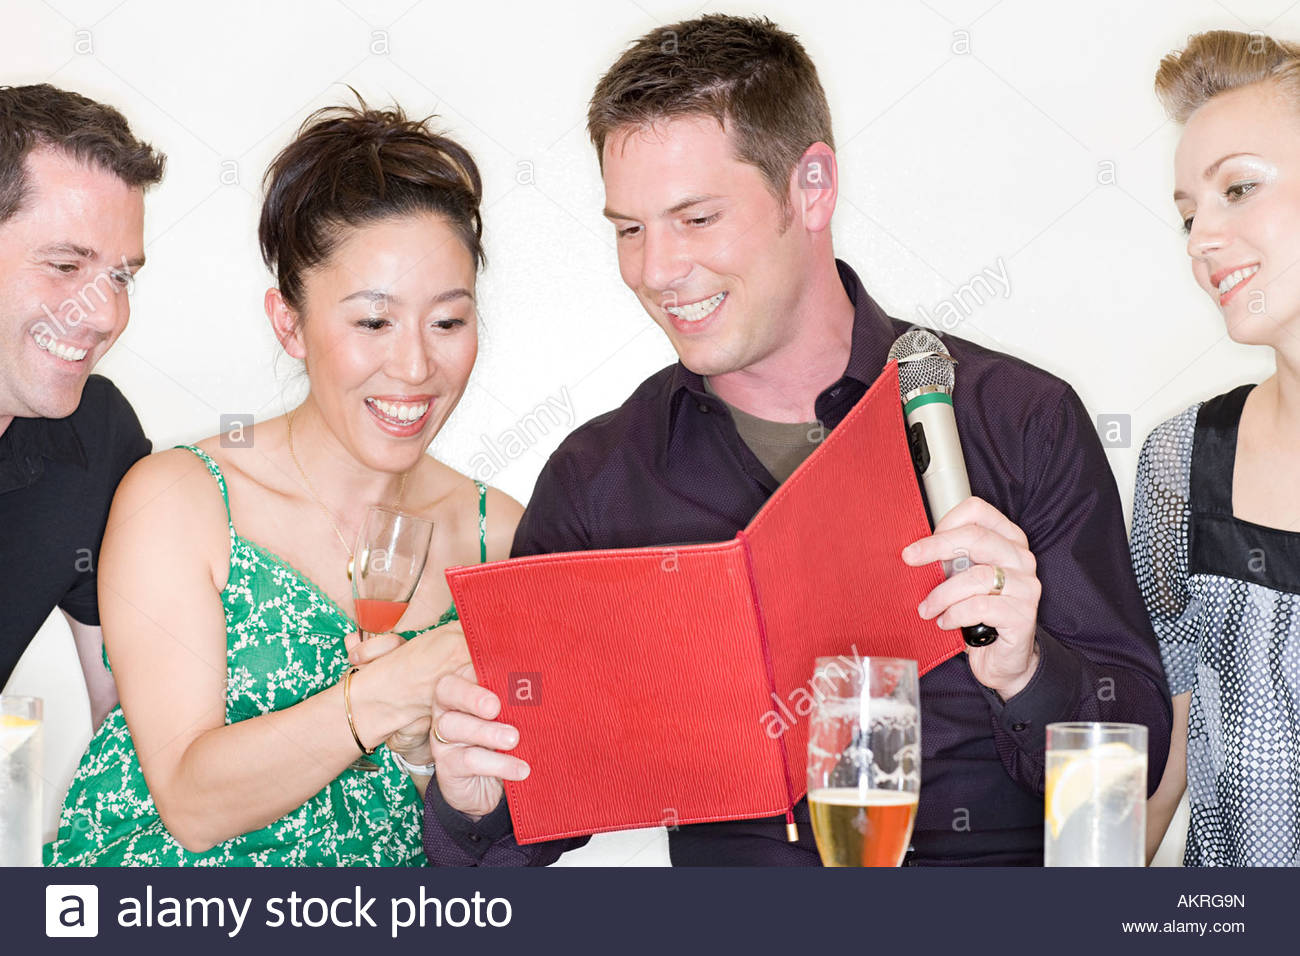 Four people choosing a karaoke song - Stock Image